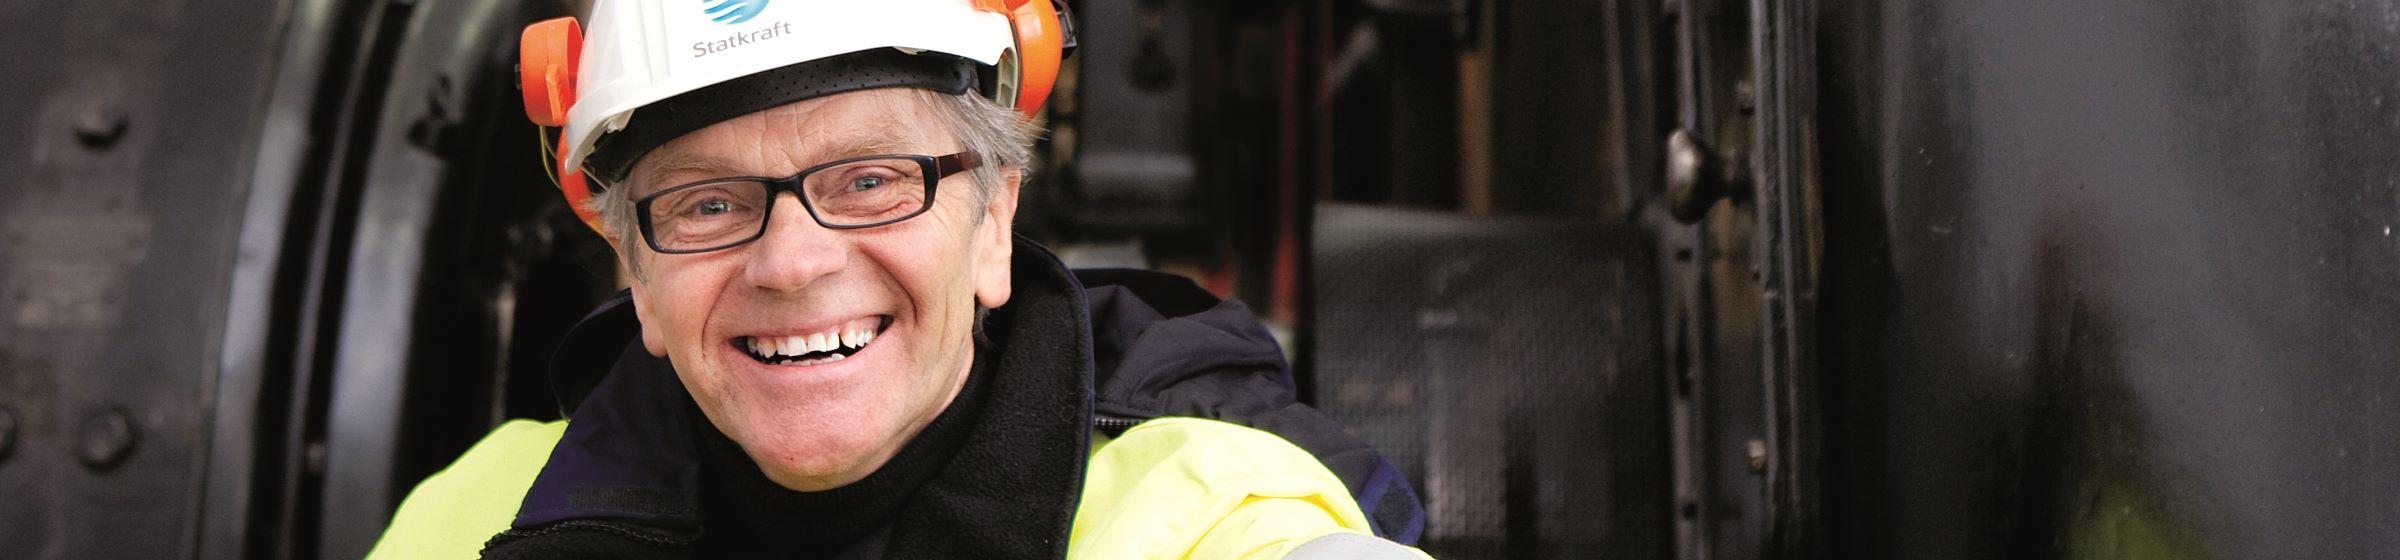 Smiling Statkraft employee with helmet